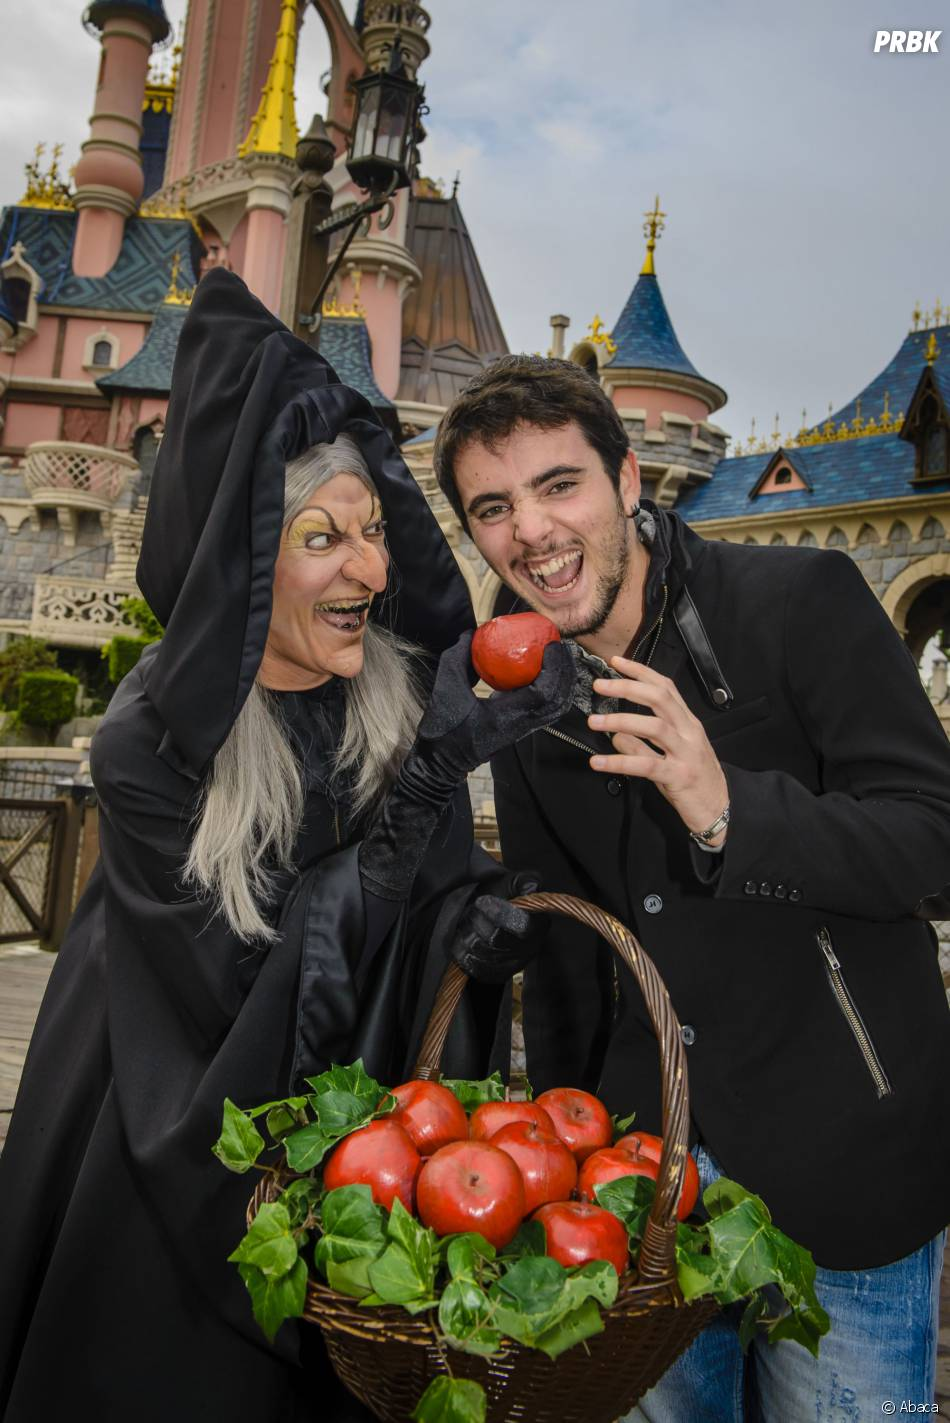 Louis Delort fête Halloween à Disneyland